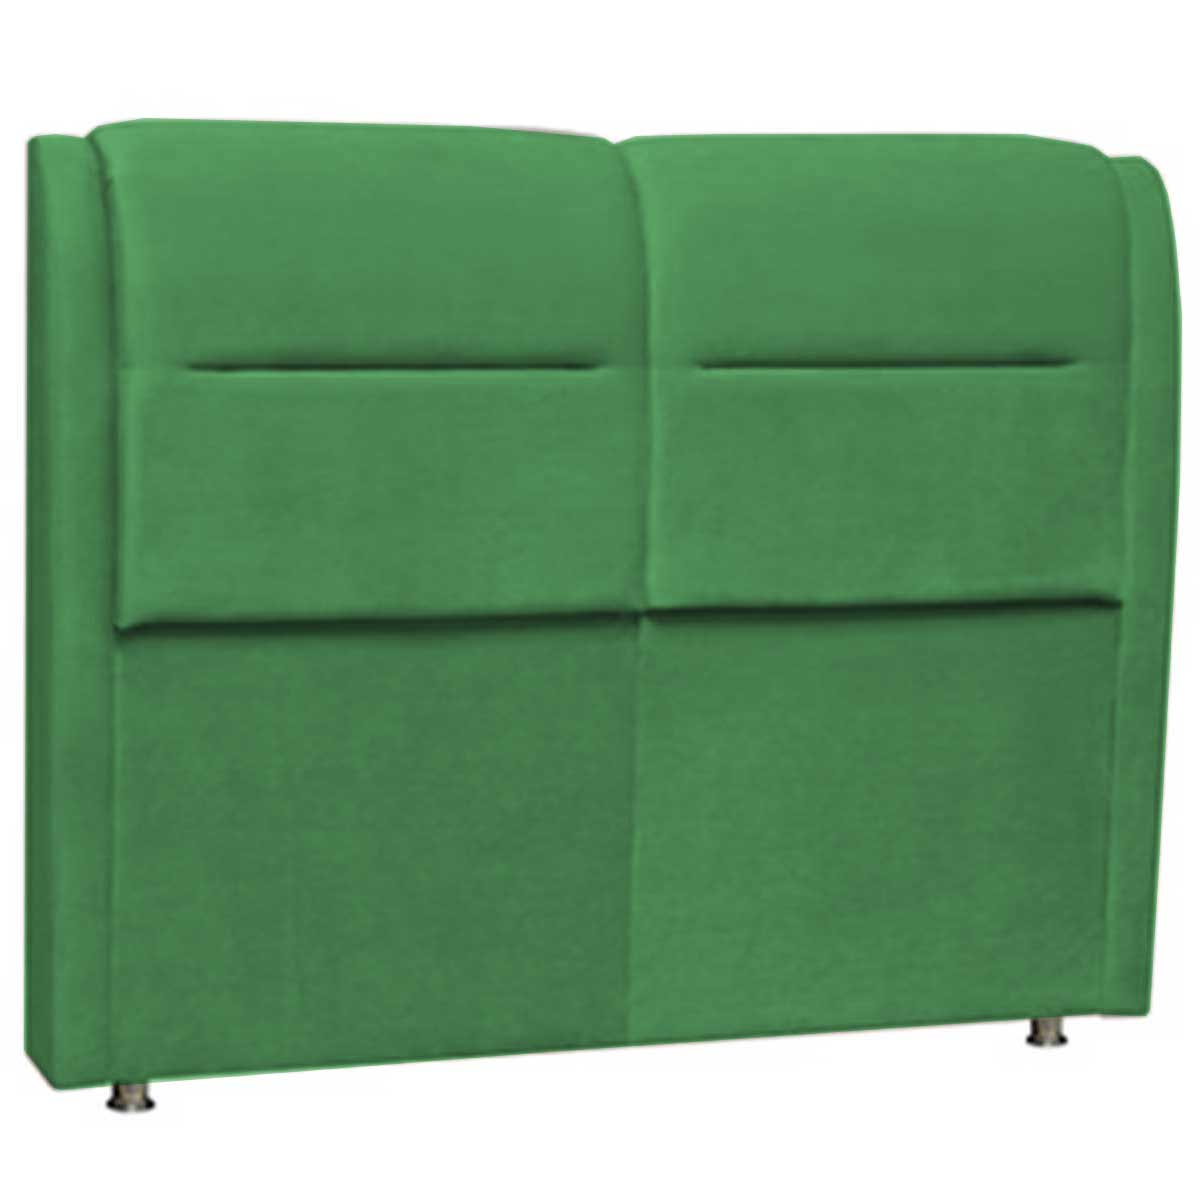 Cabeceira Verona Casal 140 cm Verde Perfan Móveis